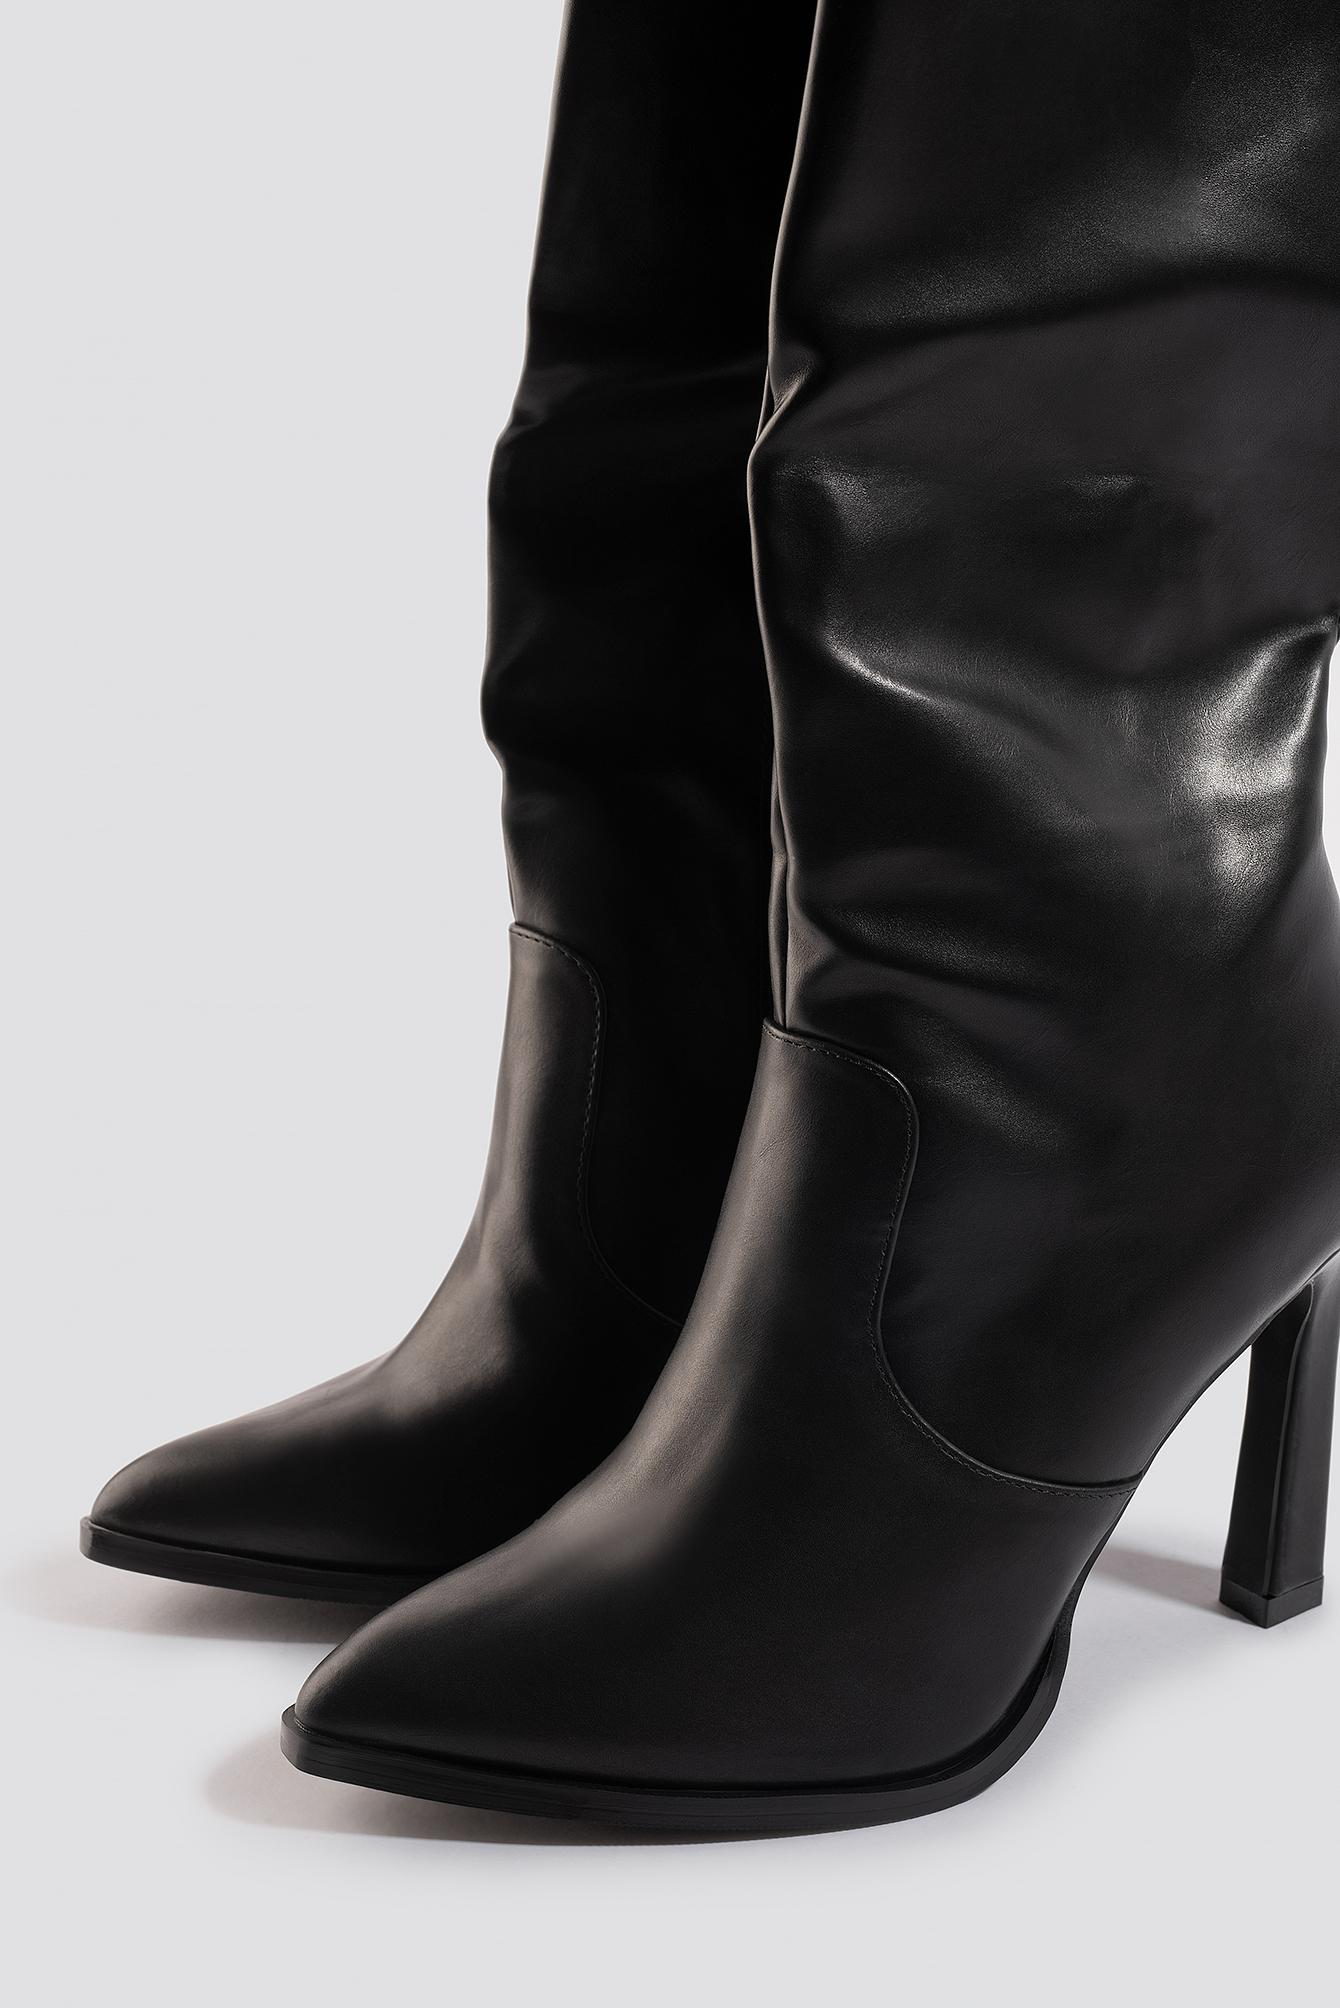 Calf High Cowboy Boots Caoutchouc NA-KD en coloris Noir